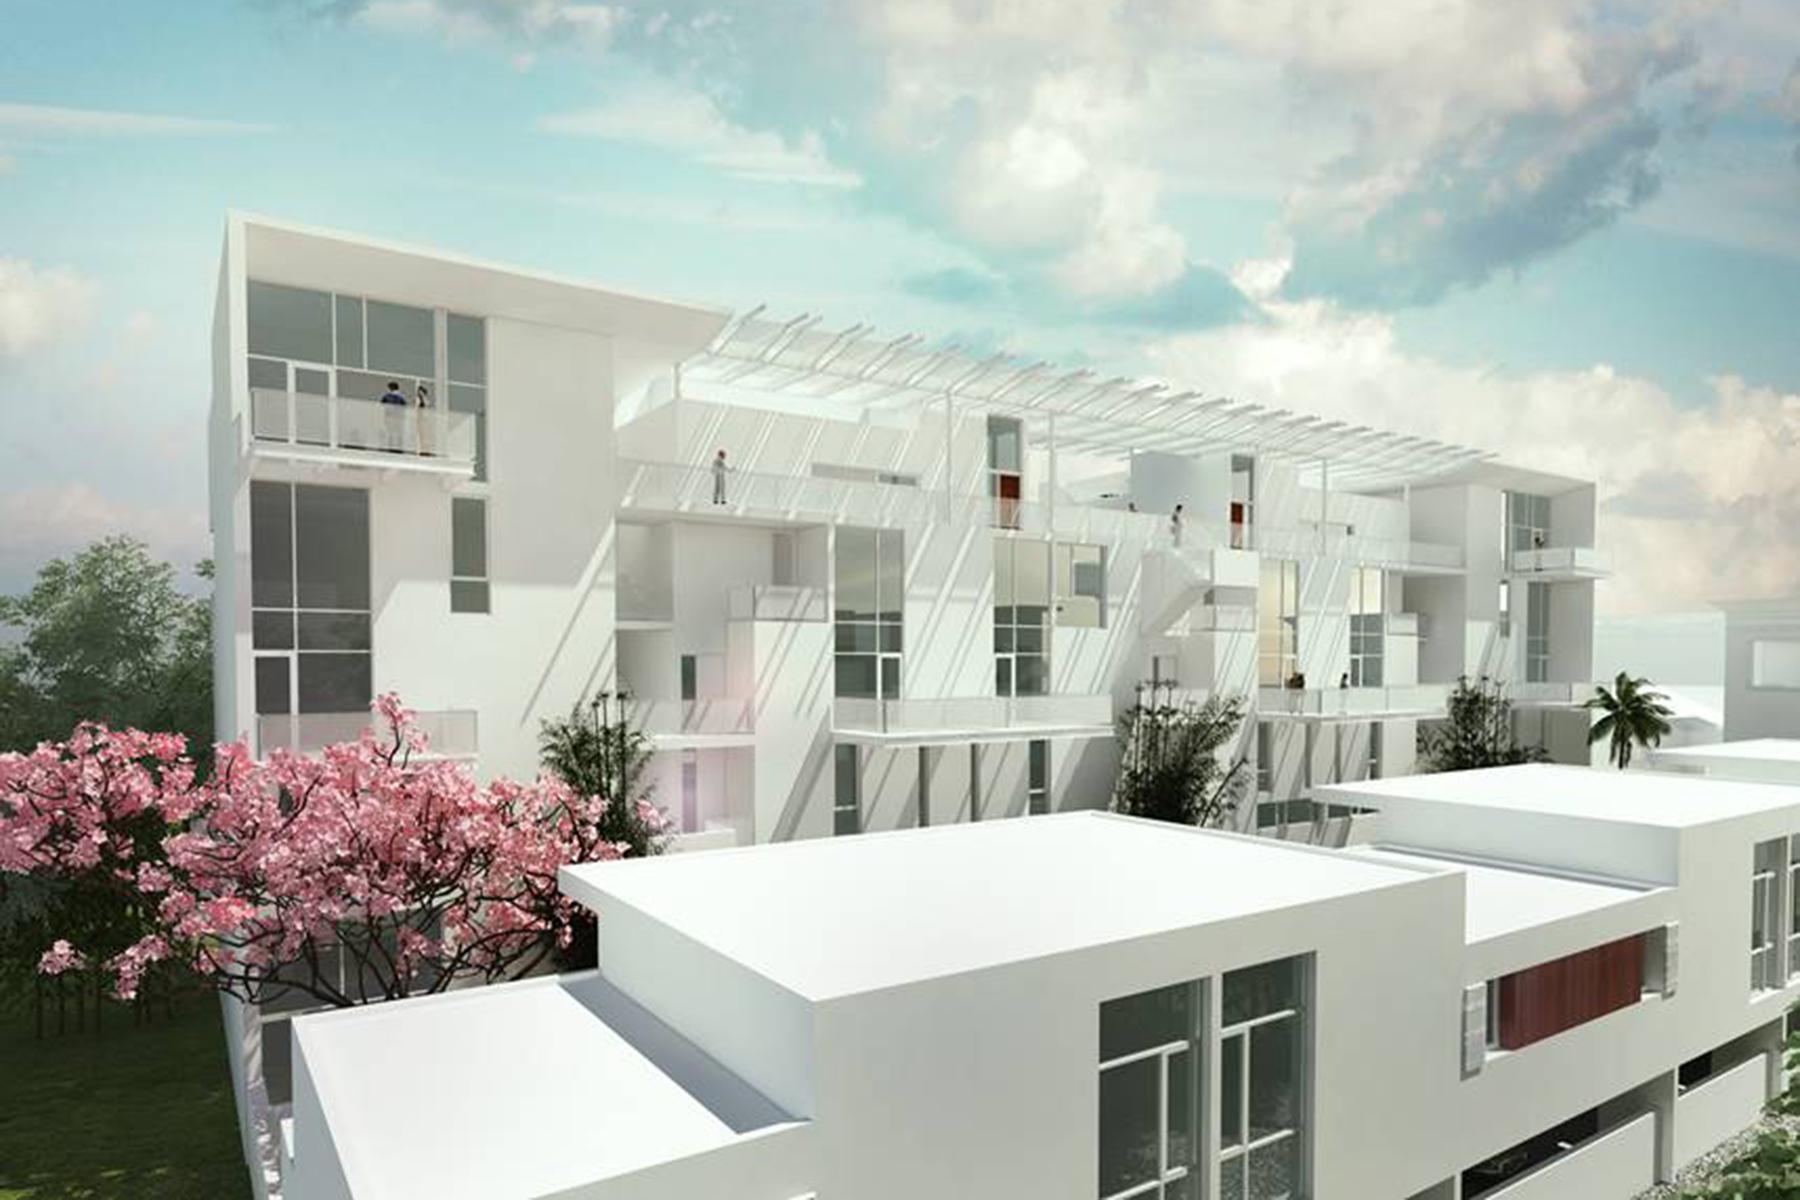 Condominium for Sale at RISDON ON 5TH 1350 5th St 101 Sarasota, Florida, 34236 United States